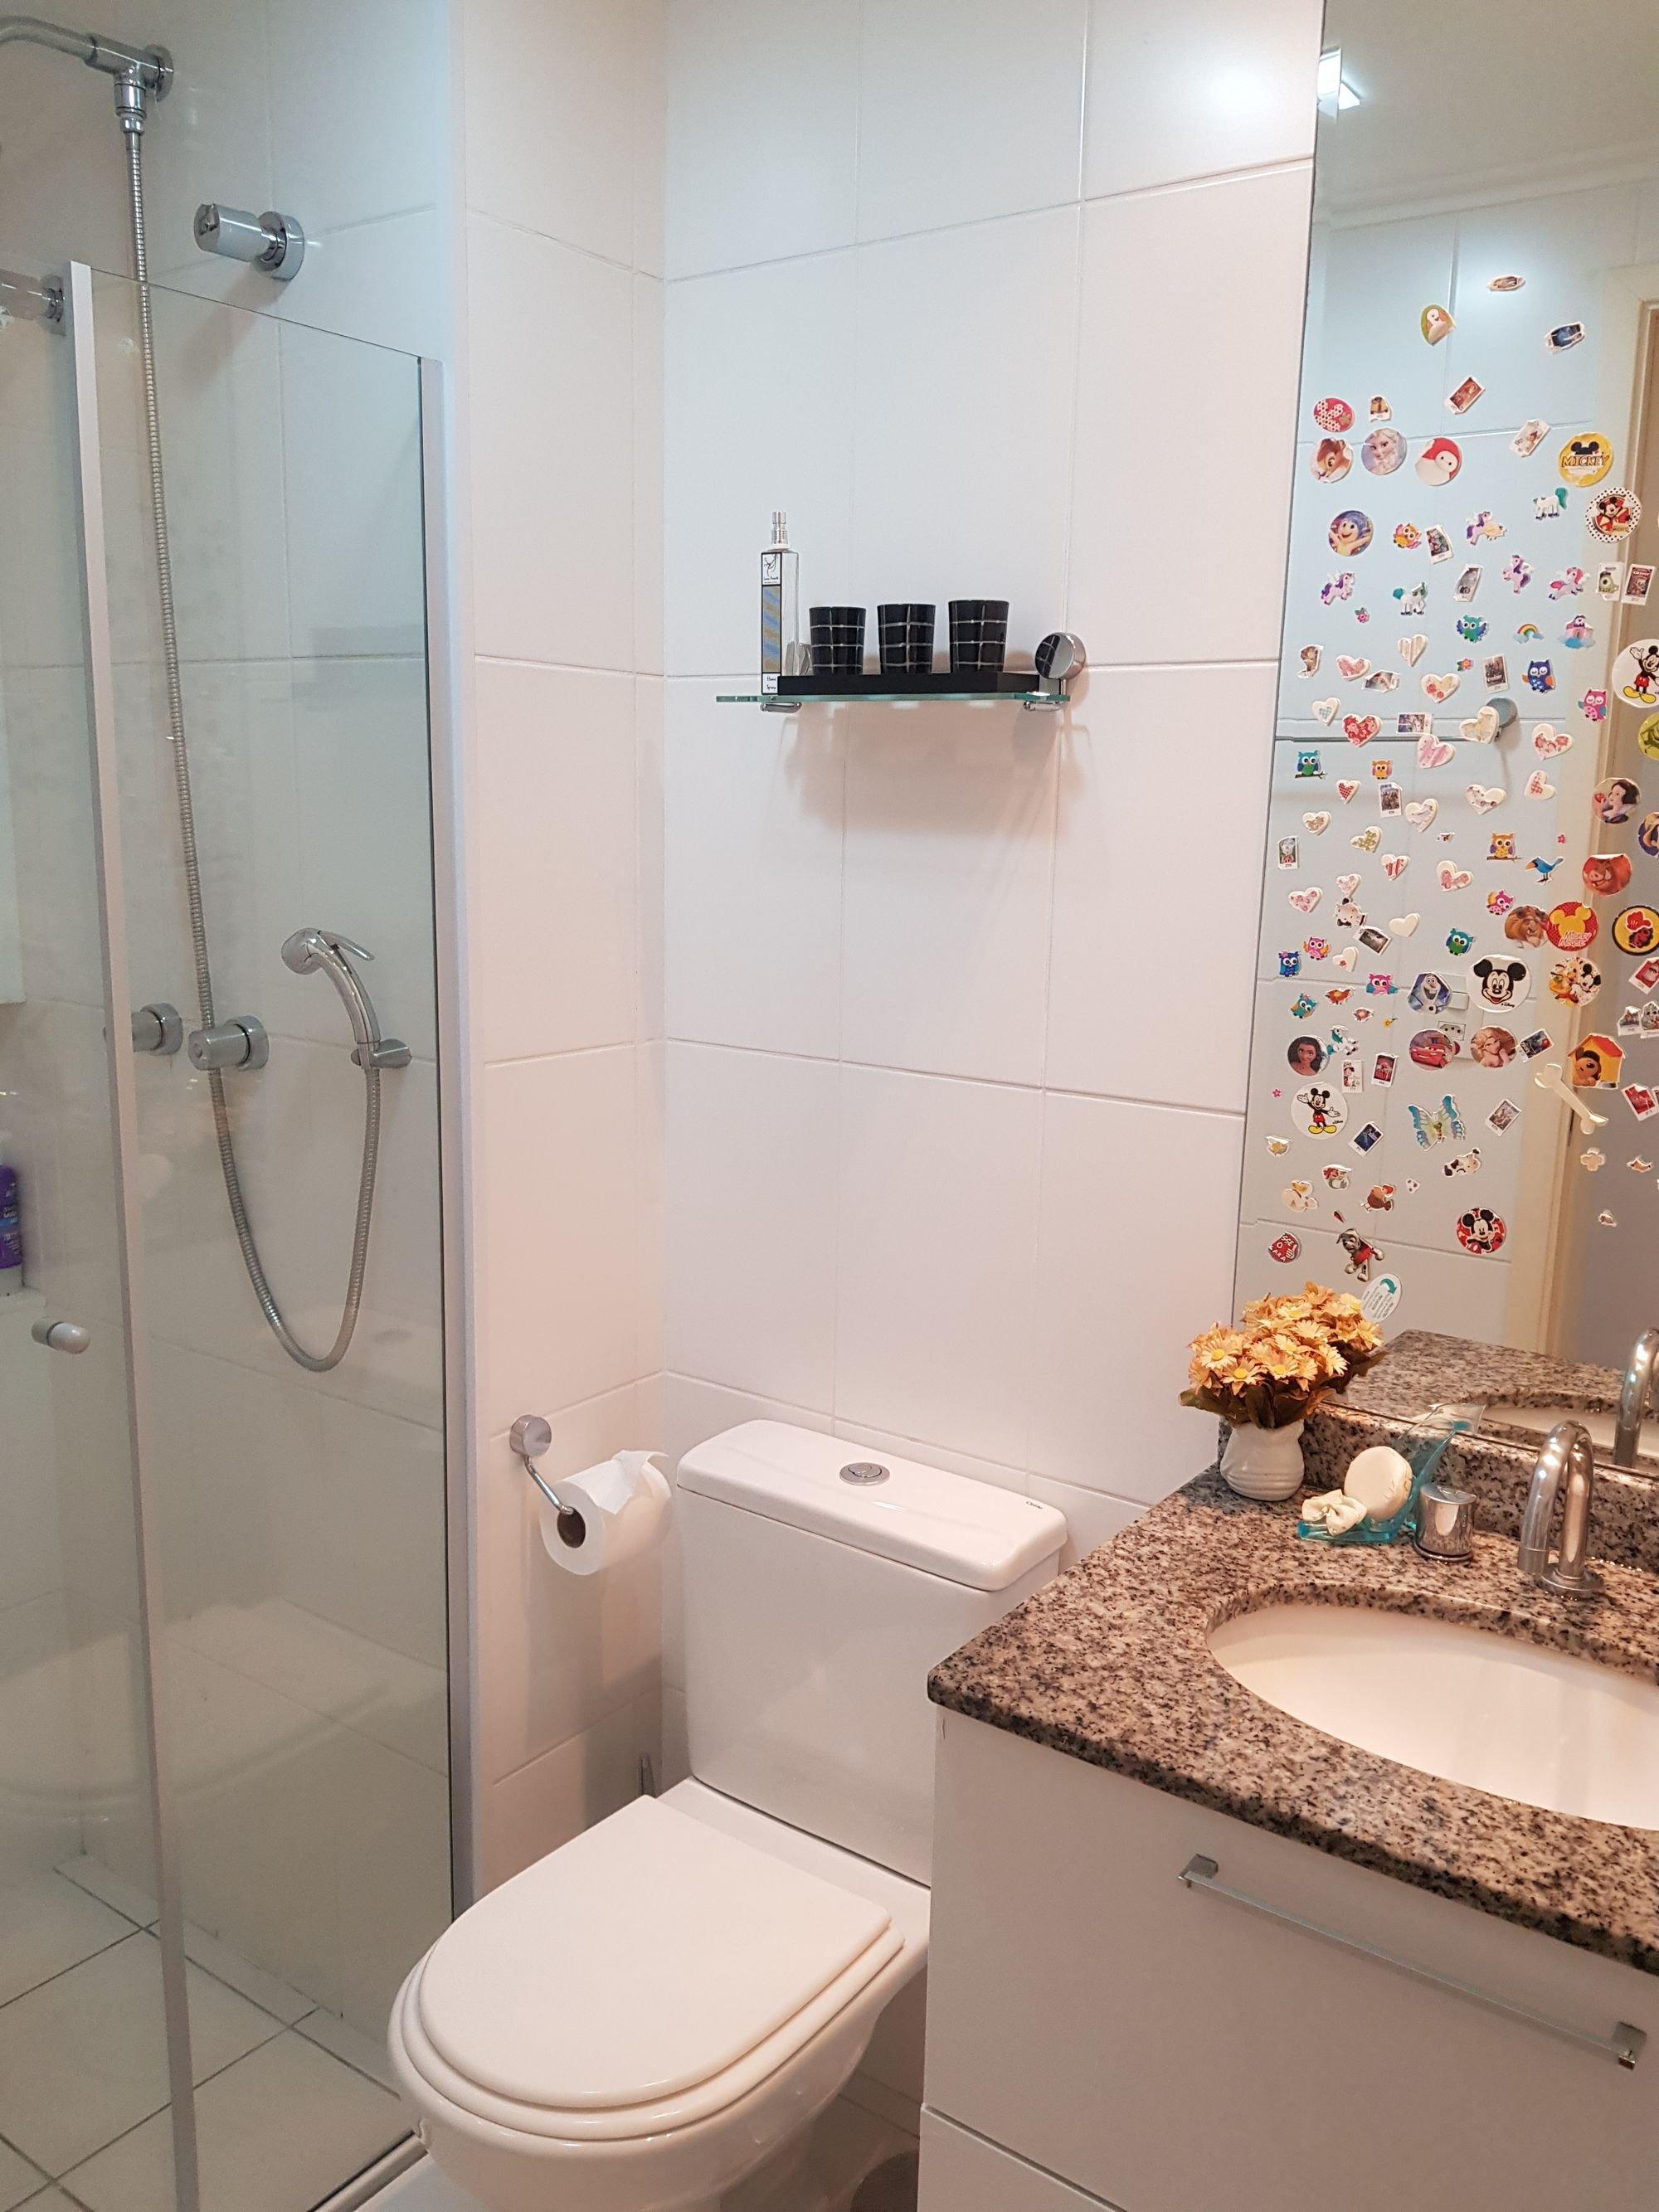 Foto de Banheiro com vaso de planta, vaso sanitário, garrafa, pia